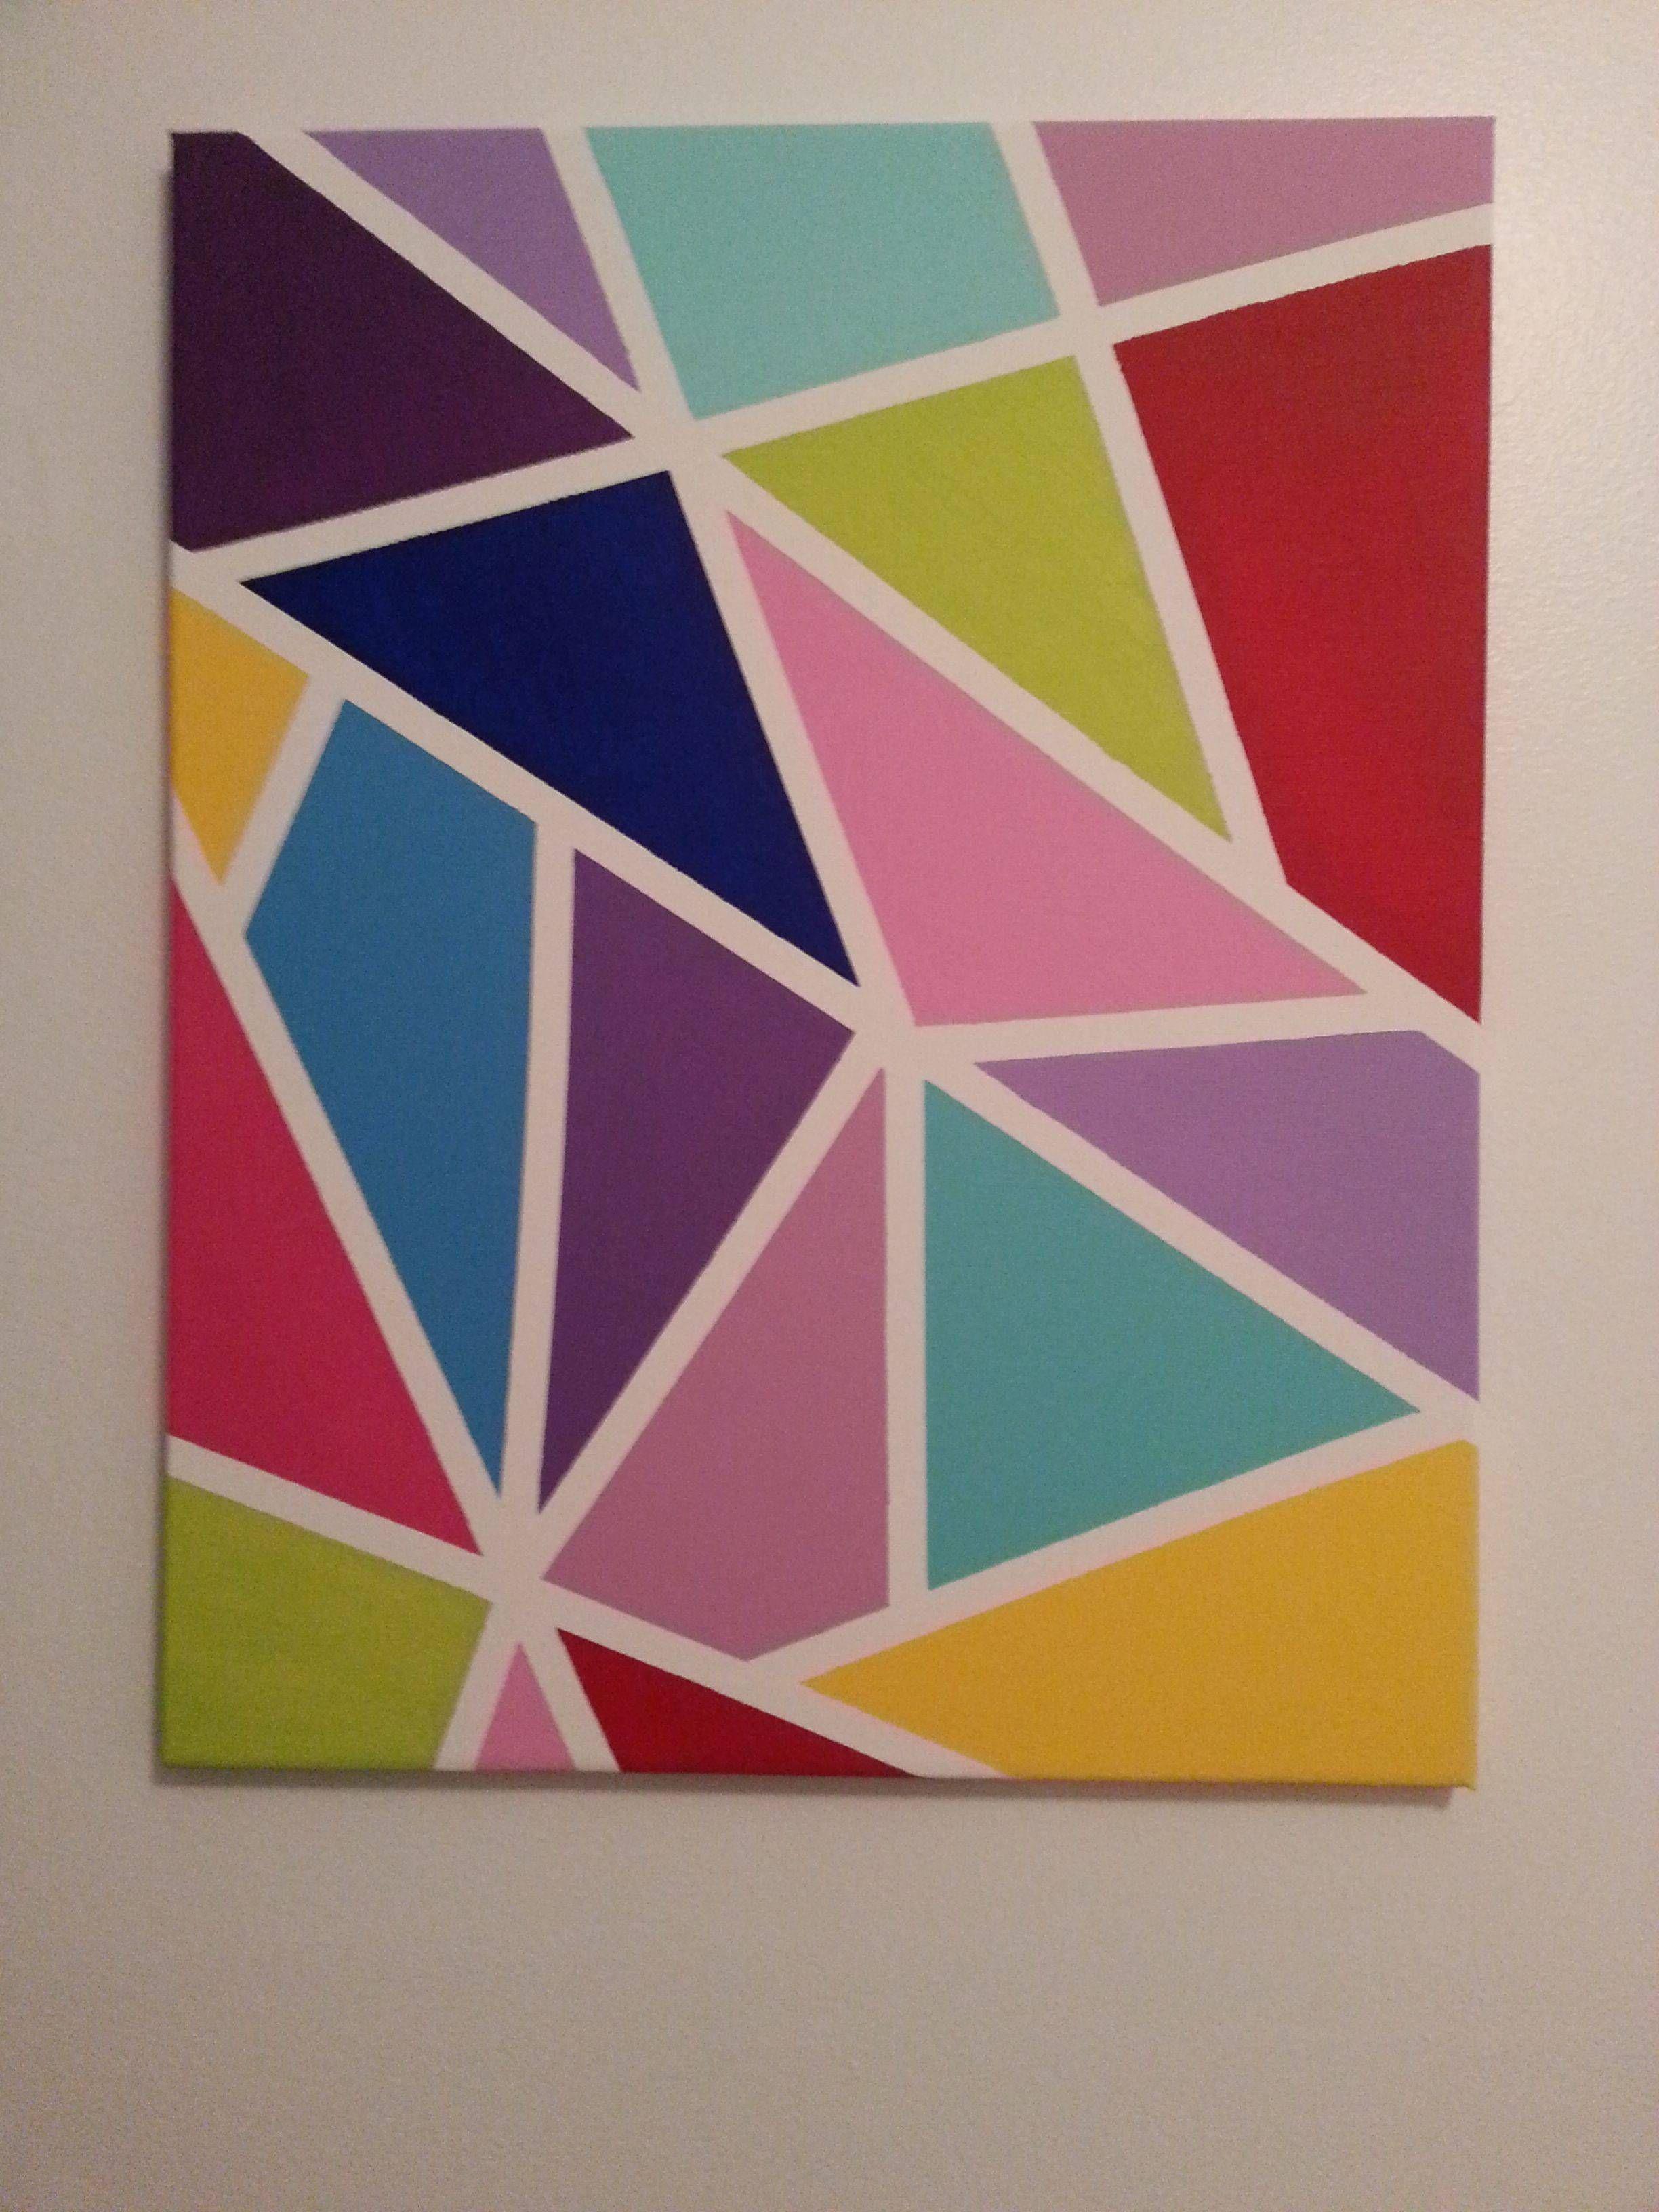 Canvas Wall Art Ideas More Image Visite Canvas Painting Diy Diy Canvas Wall Art Simple Canvas Paintings